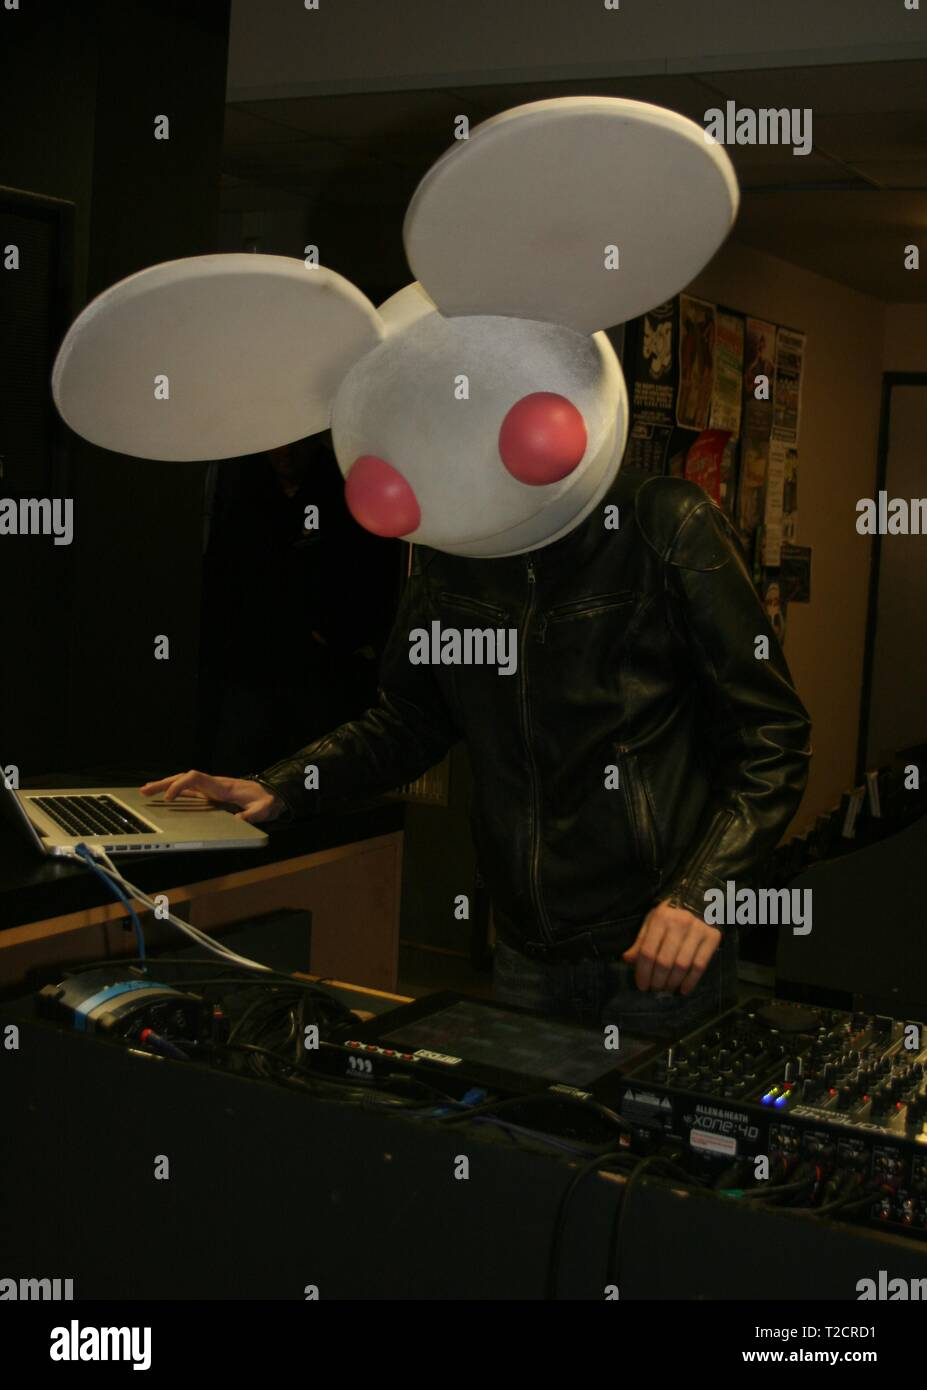 Joel Thomas Zimmerman, known professionally as Deadmau5, is